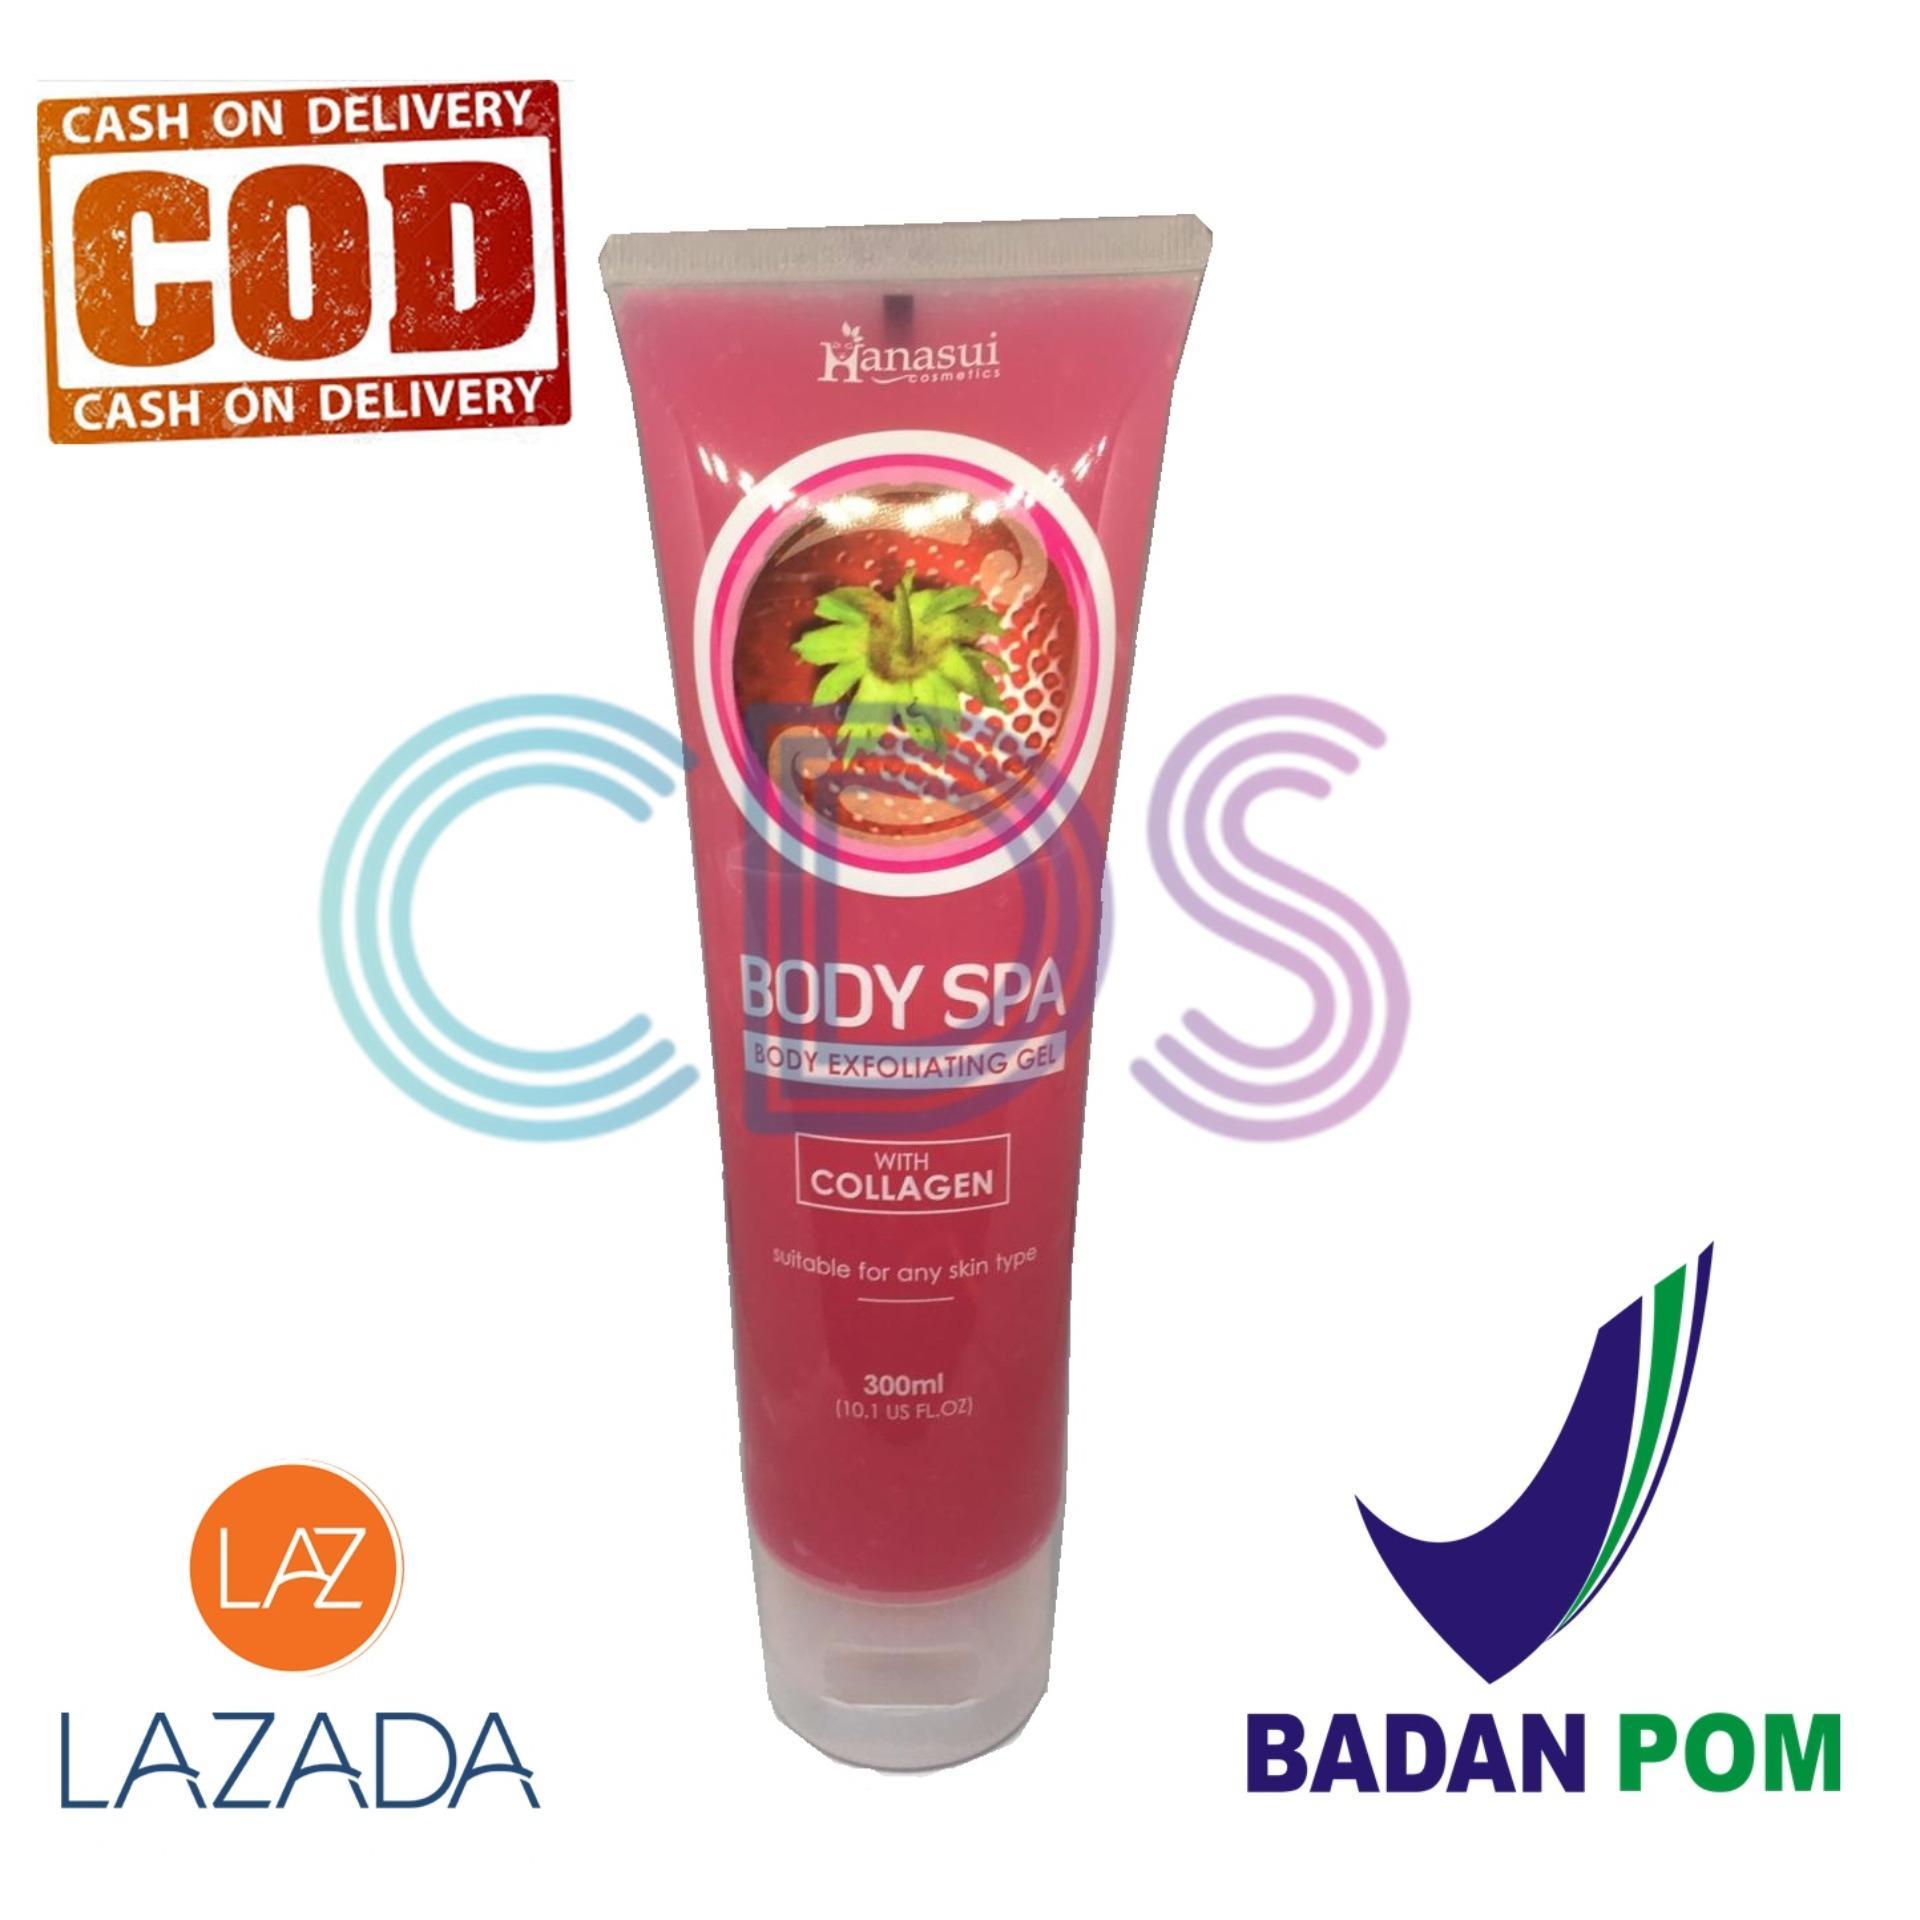 Hanasui Body Spa Exfoliating Gel With Collagen Peeling Gel Perontok Daki - Strawberry